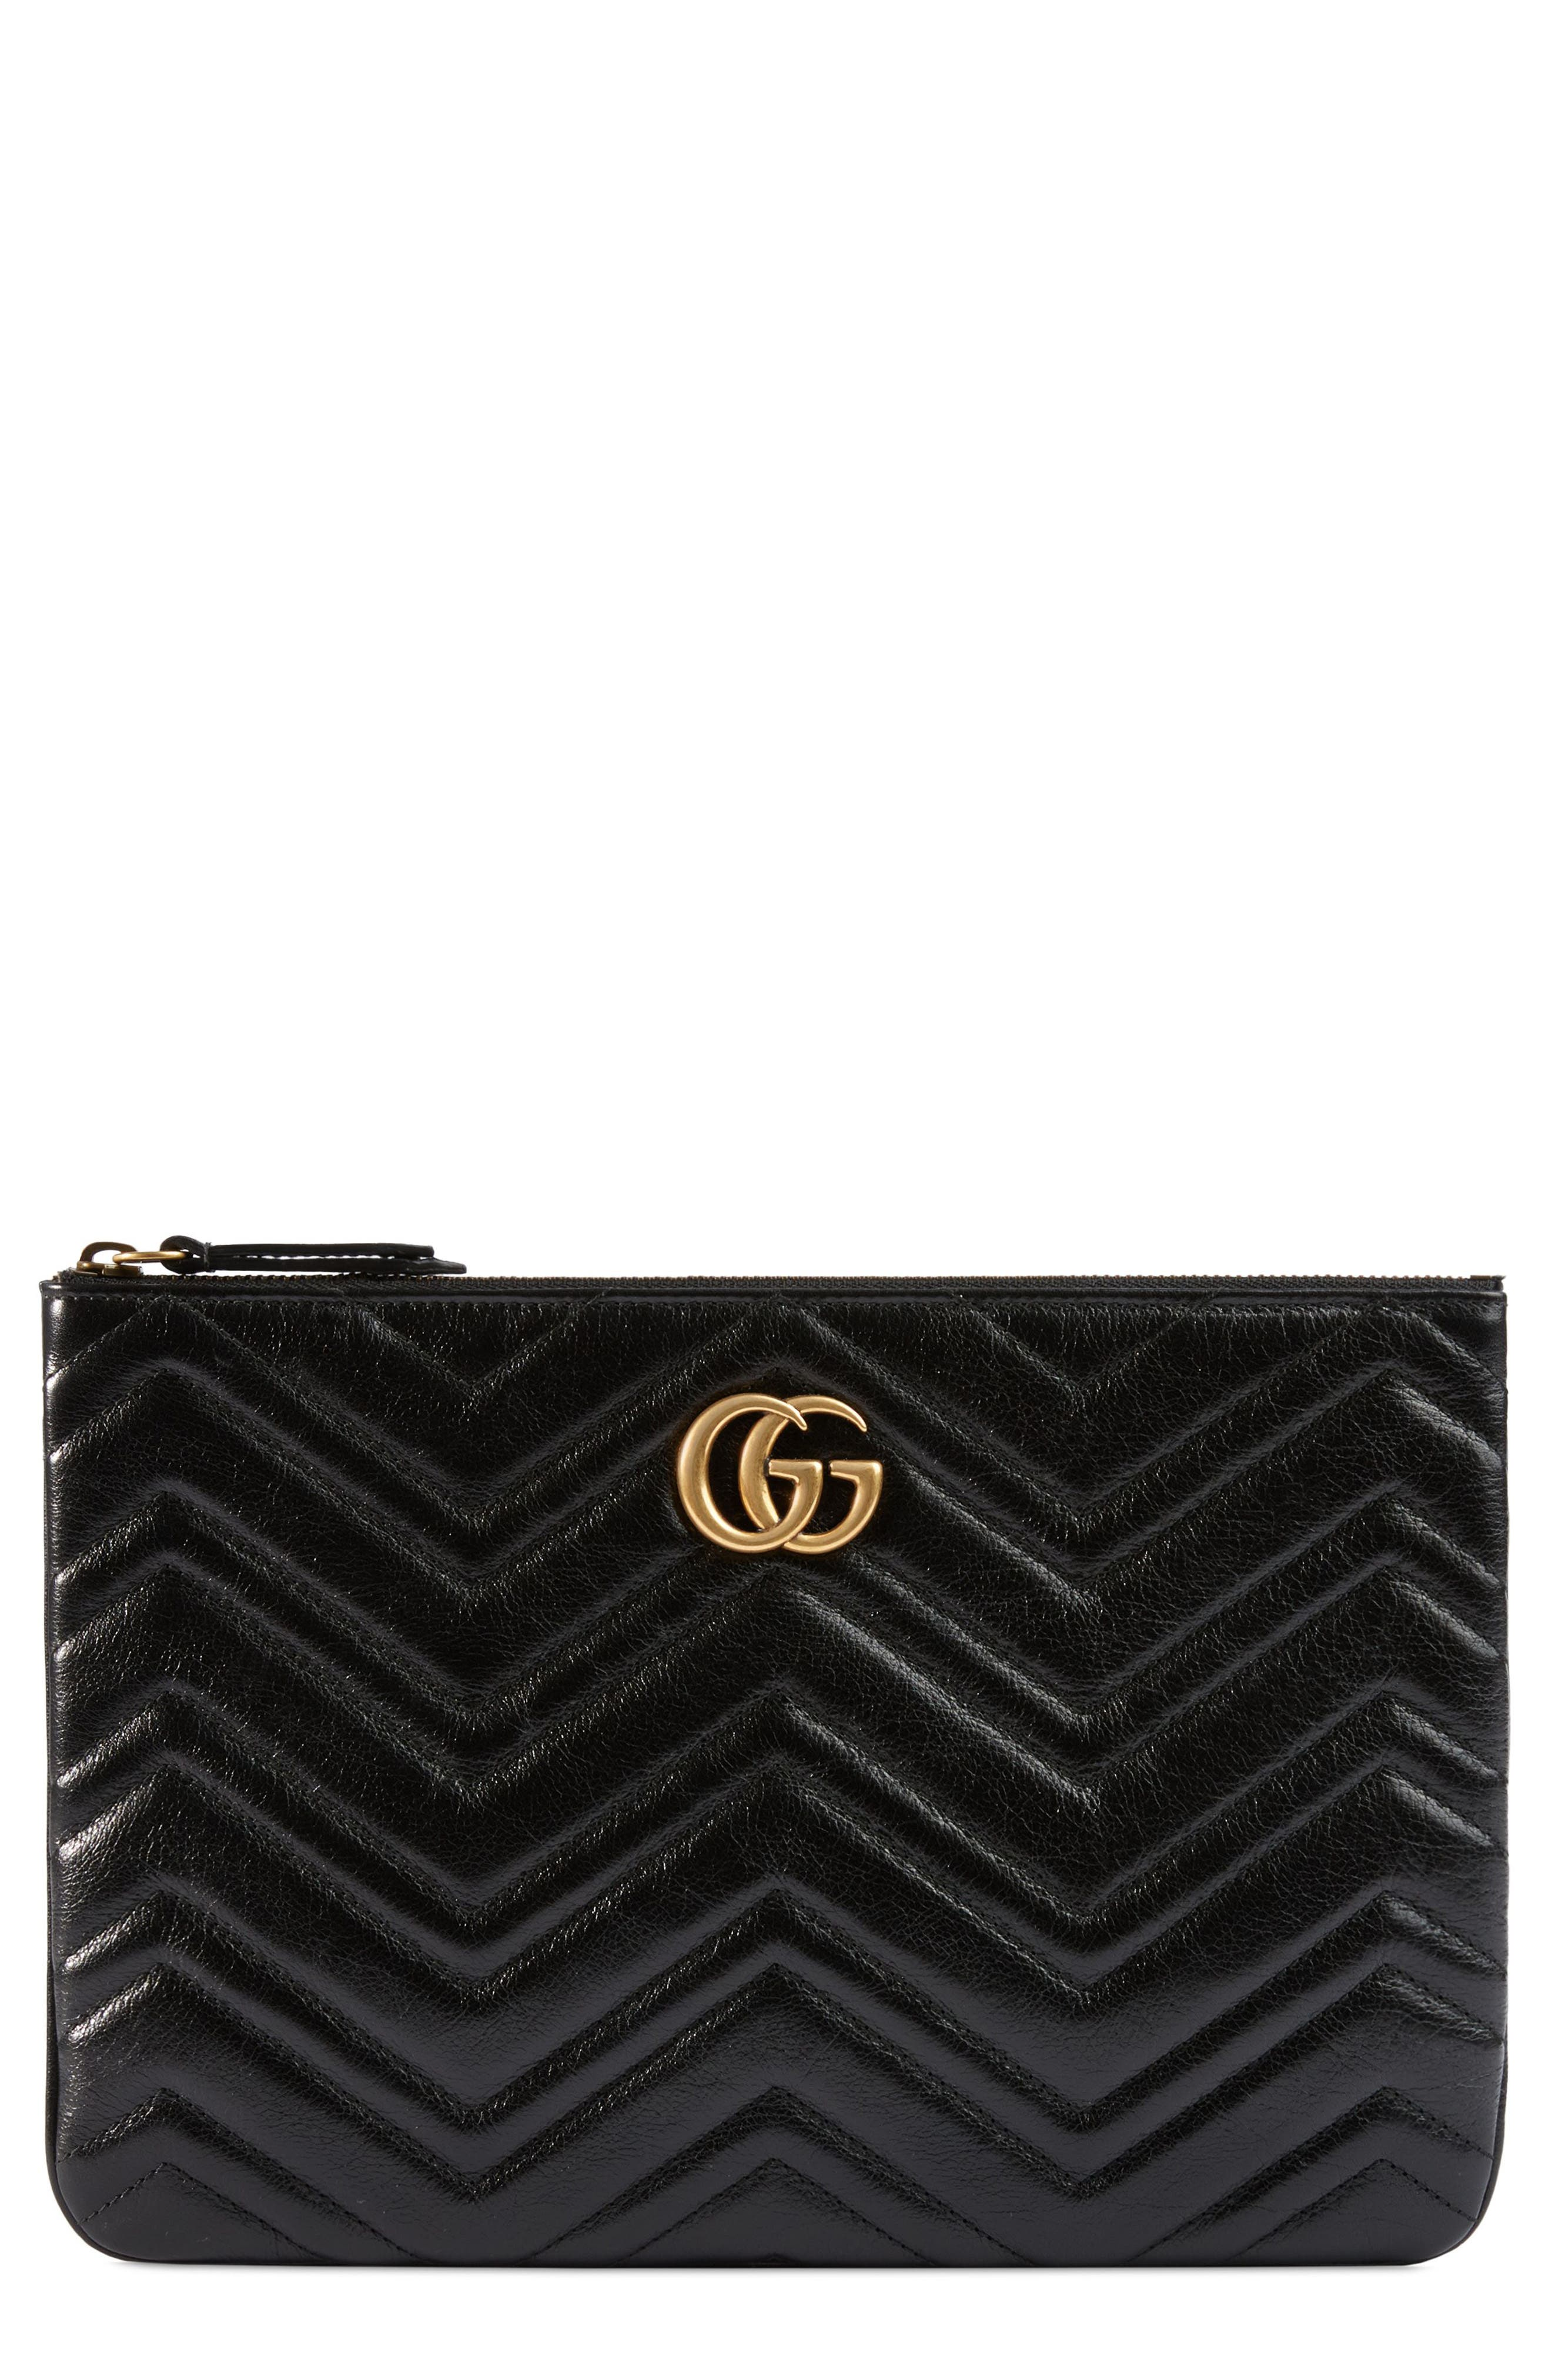 GG Marmont 2.0 Matelassé Leather Pouch,                         Main,                         color, NERO/ NERO